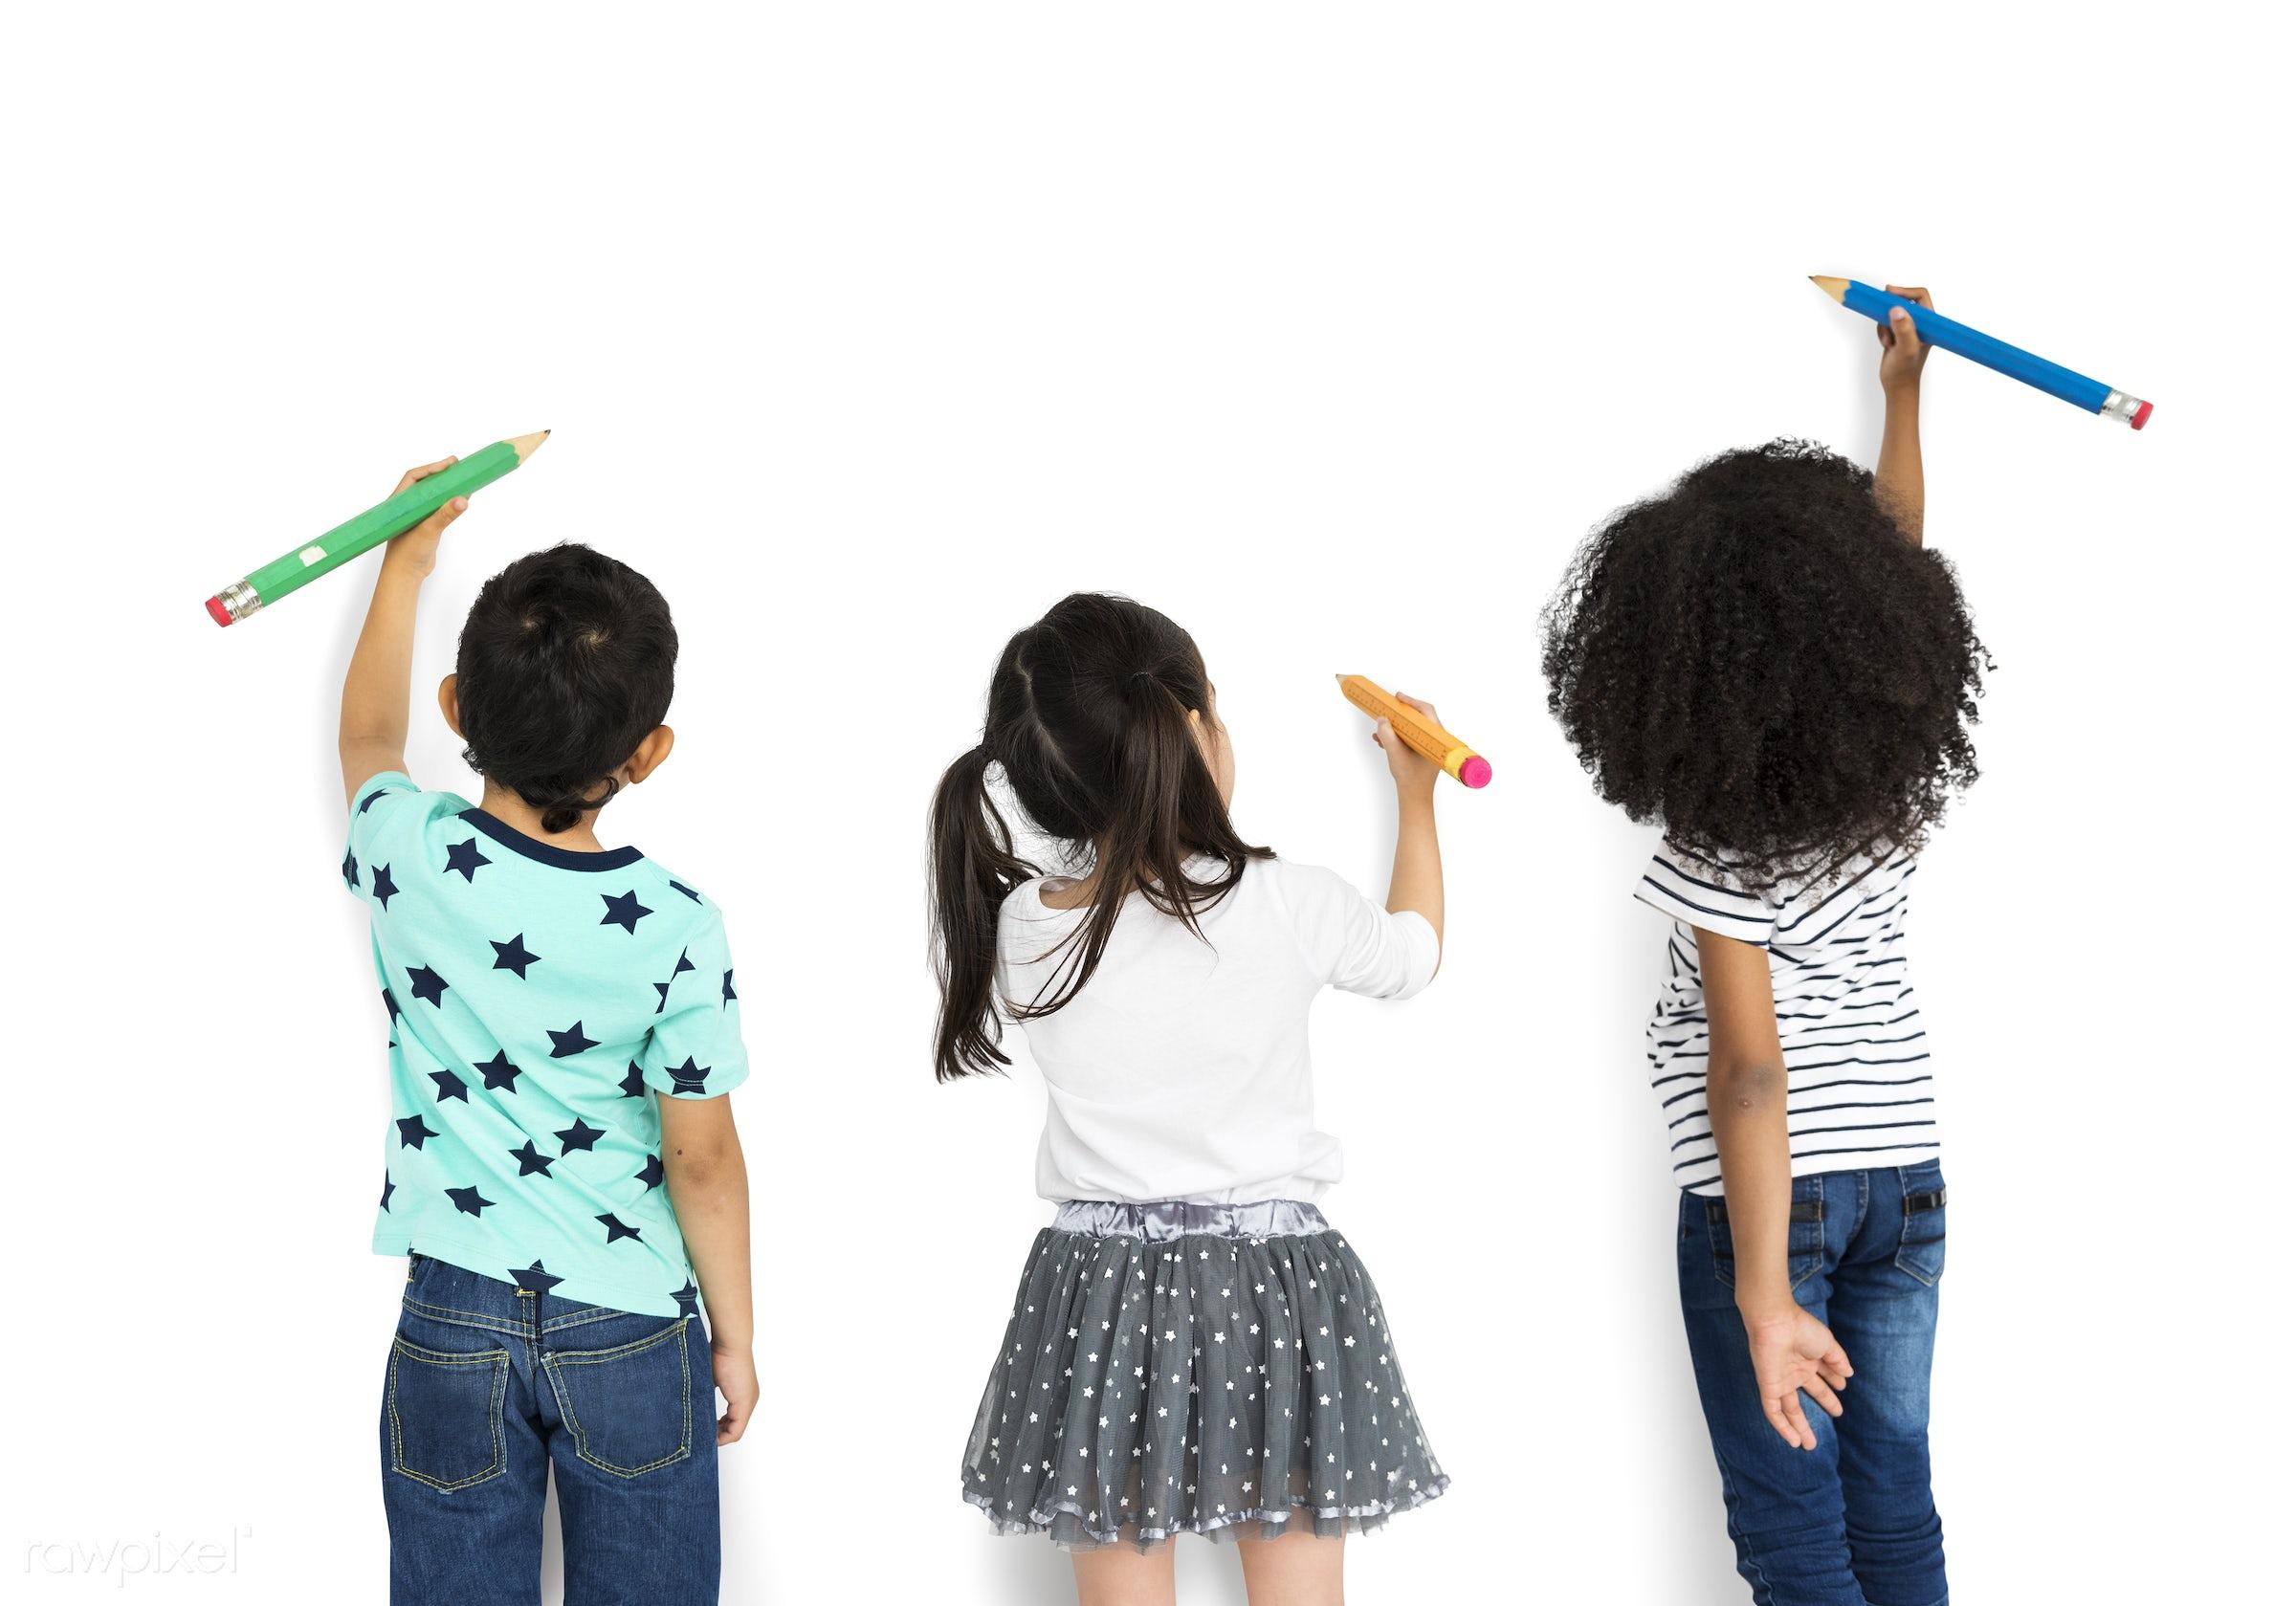 studio, expression, person, little, recreation, people, kid, friendship, isolated, schoolgirl, little girl, paint, leisure,...